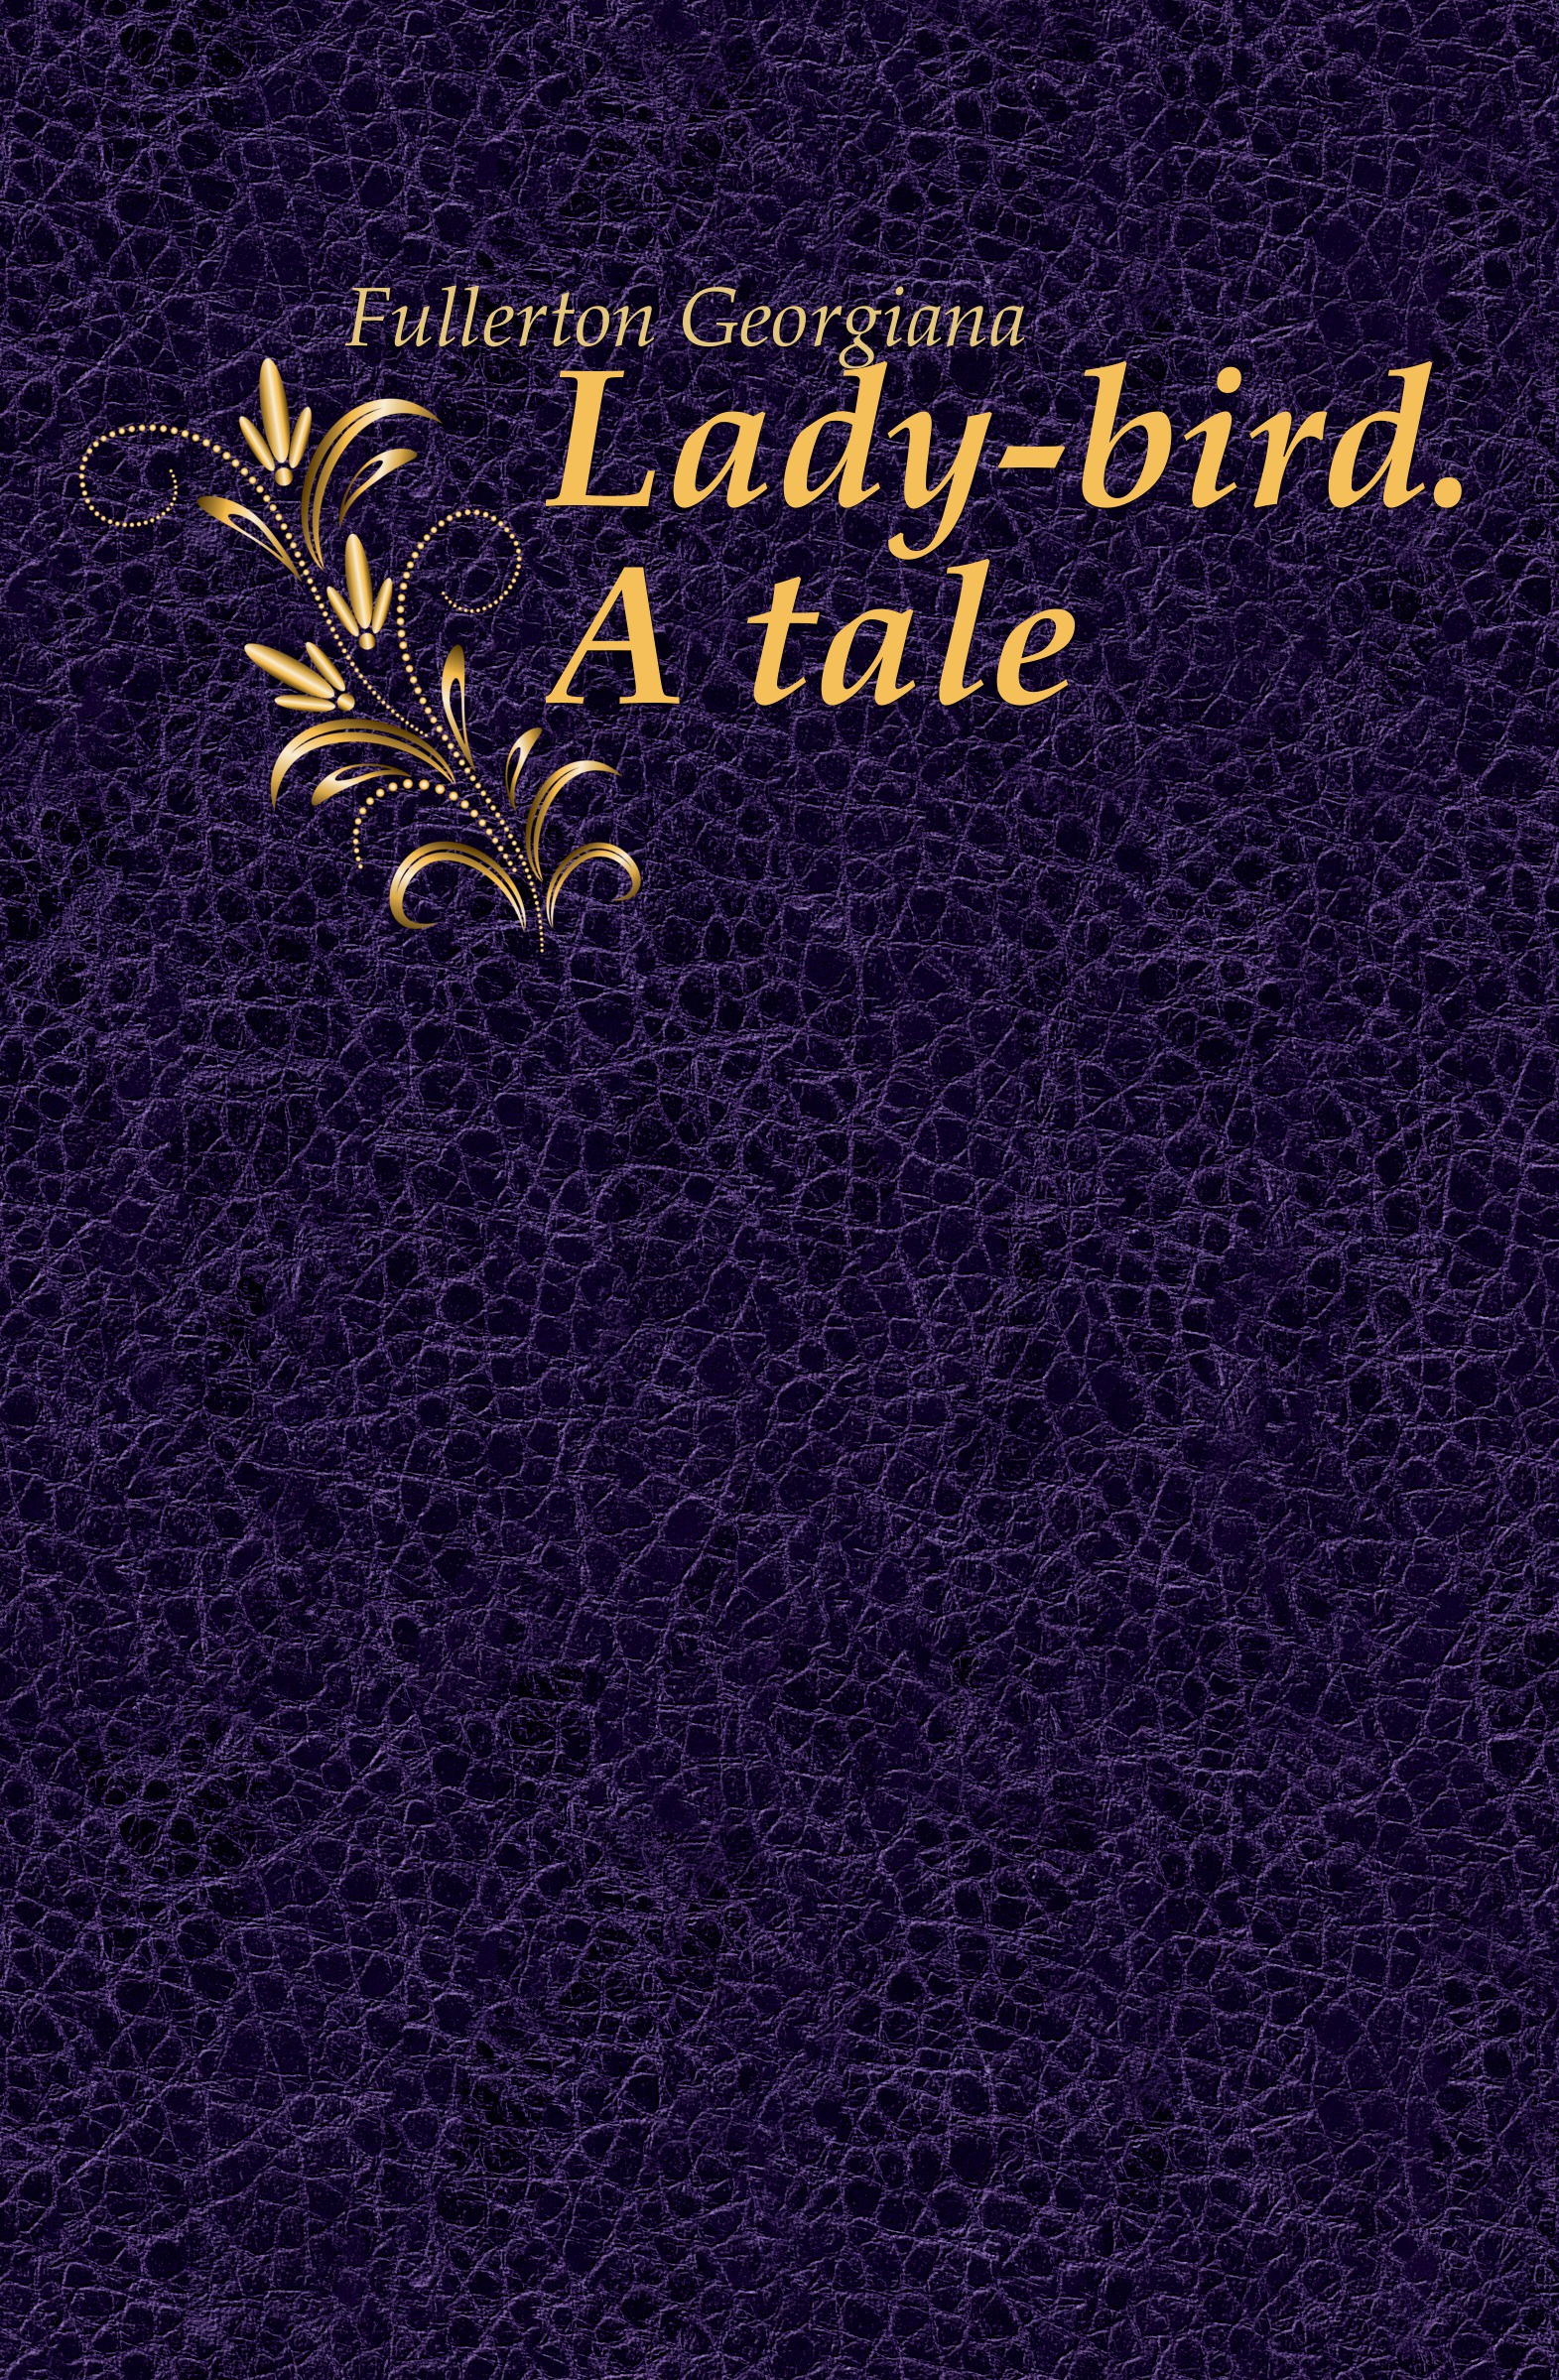 Fullerton Georgiana Lady-bird. A tale